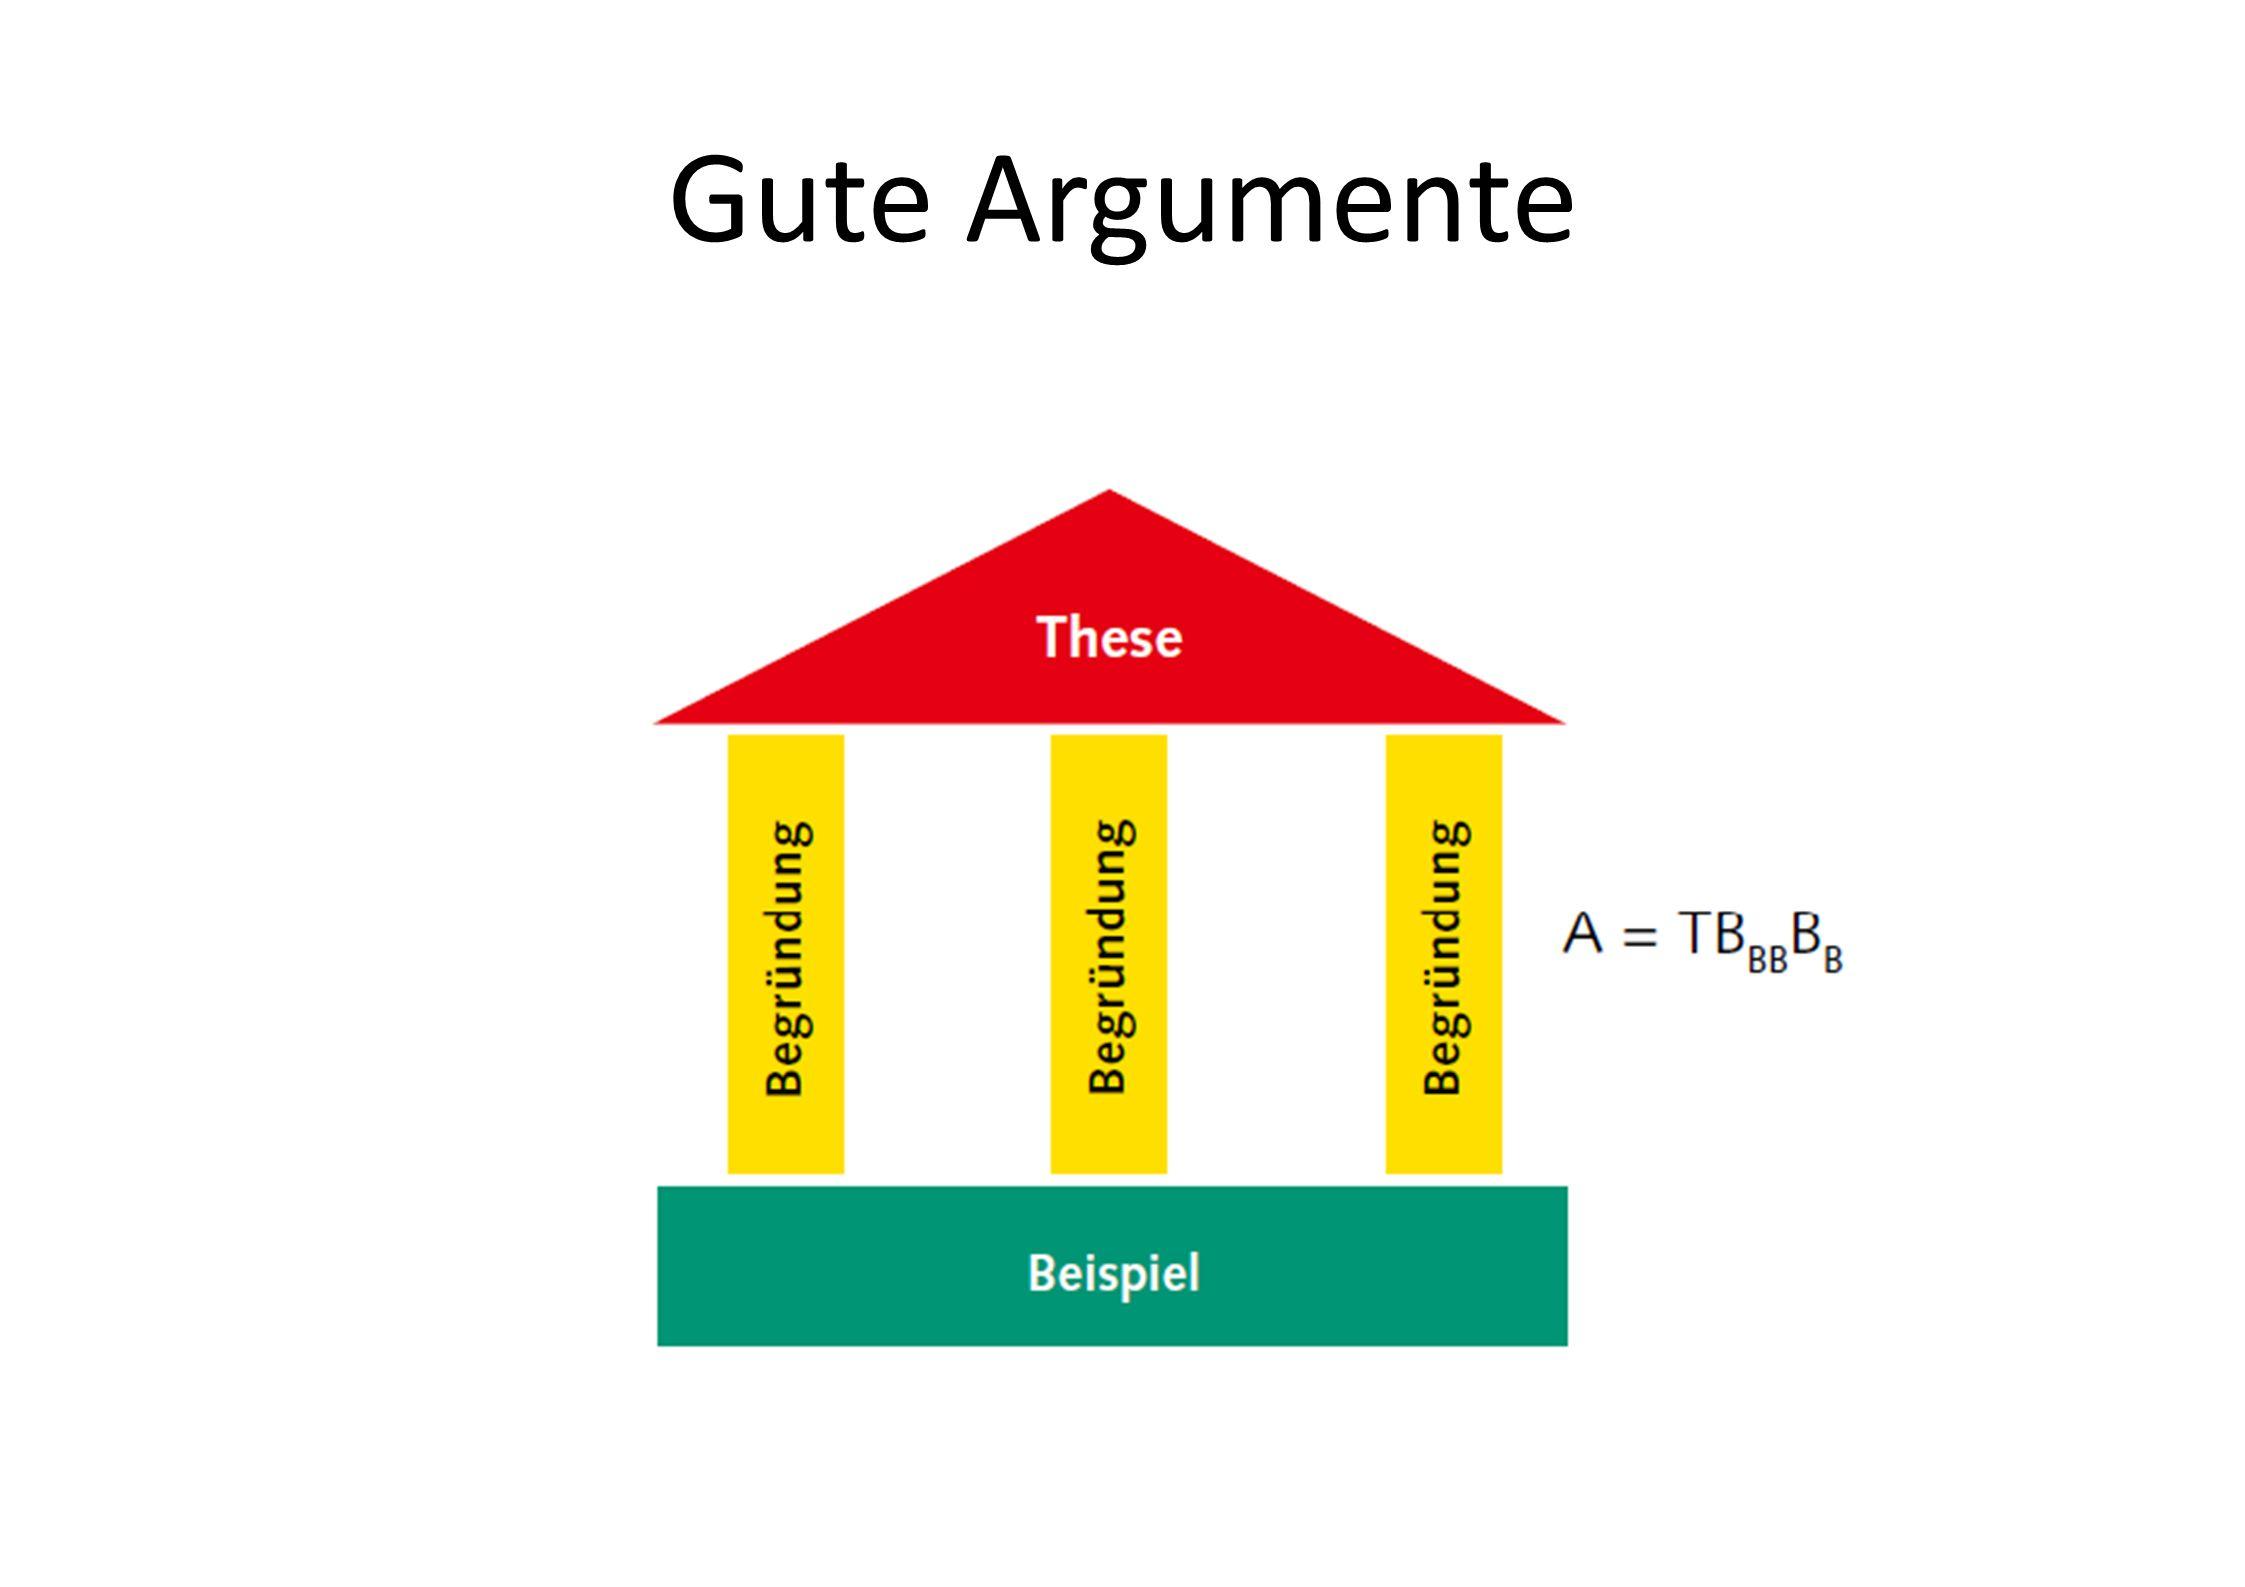 Quelle: http://www.informationisbeautiful.net/visualizations/rhetological-fallacies/http://www.informationisbeautiful.net/visualizations/rhetological-fallacies/